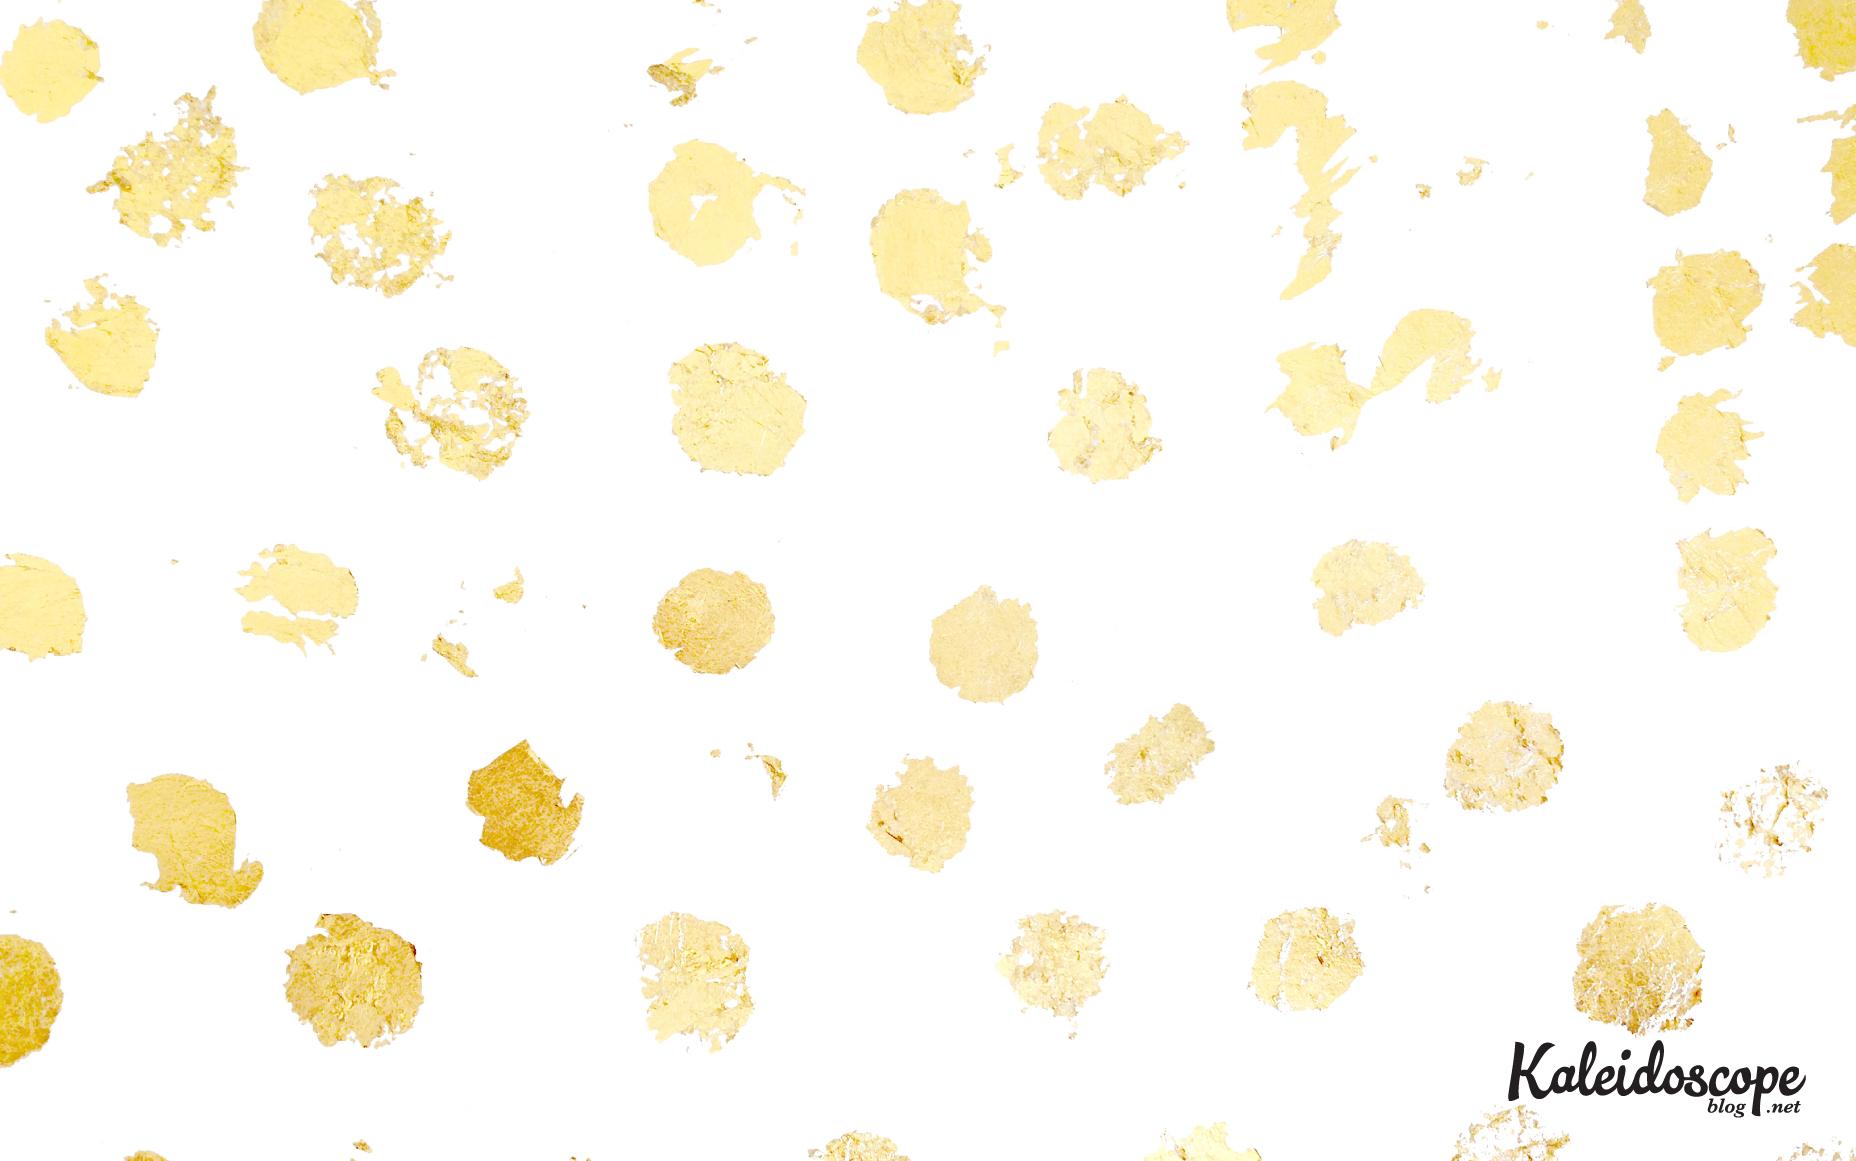 Kaleidoscope-Desktop-Wallpaper-December